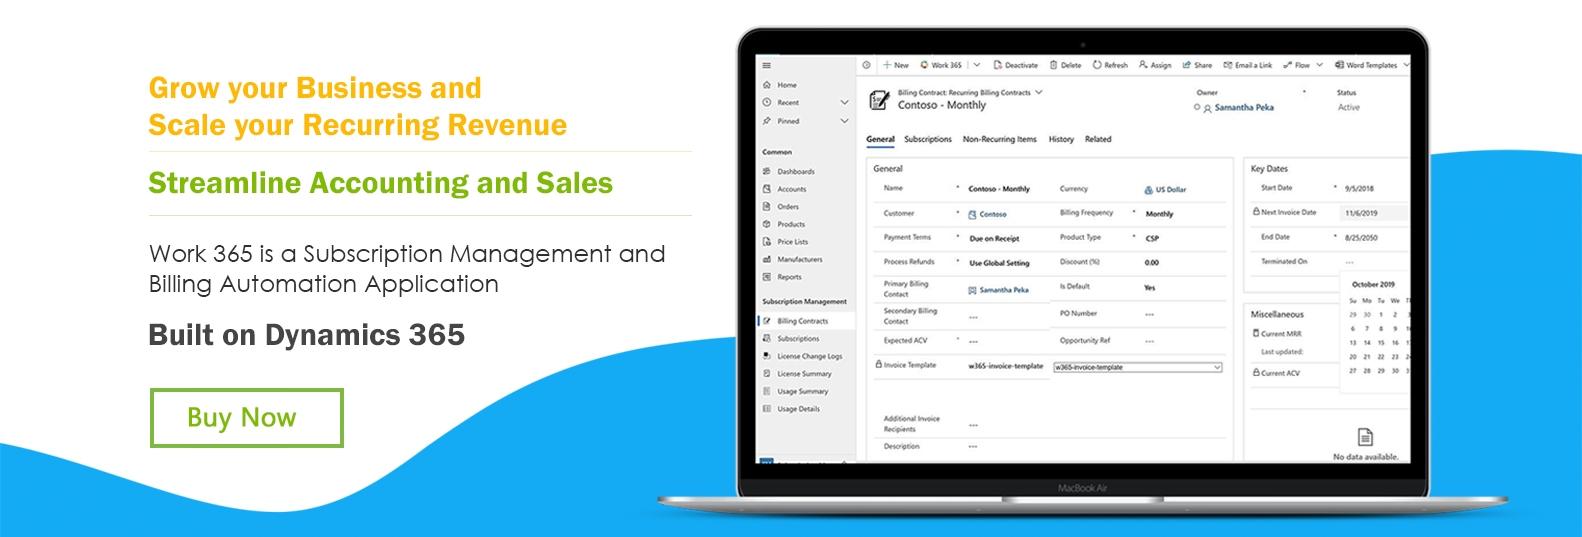 Work 365 Subscription Management and Billing Automation Platform